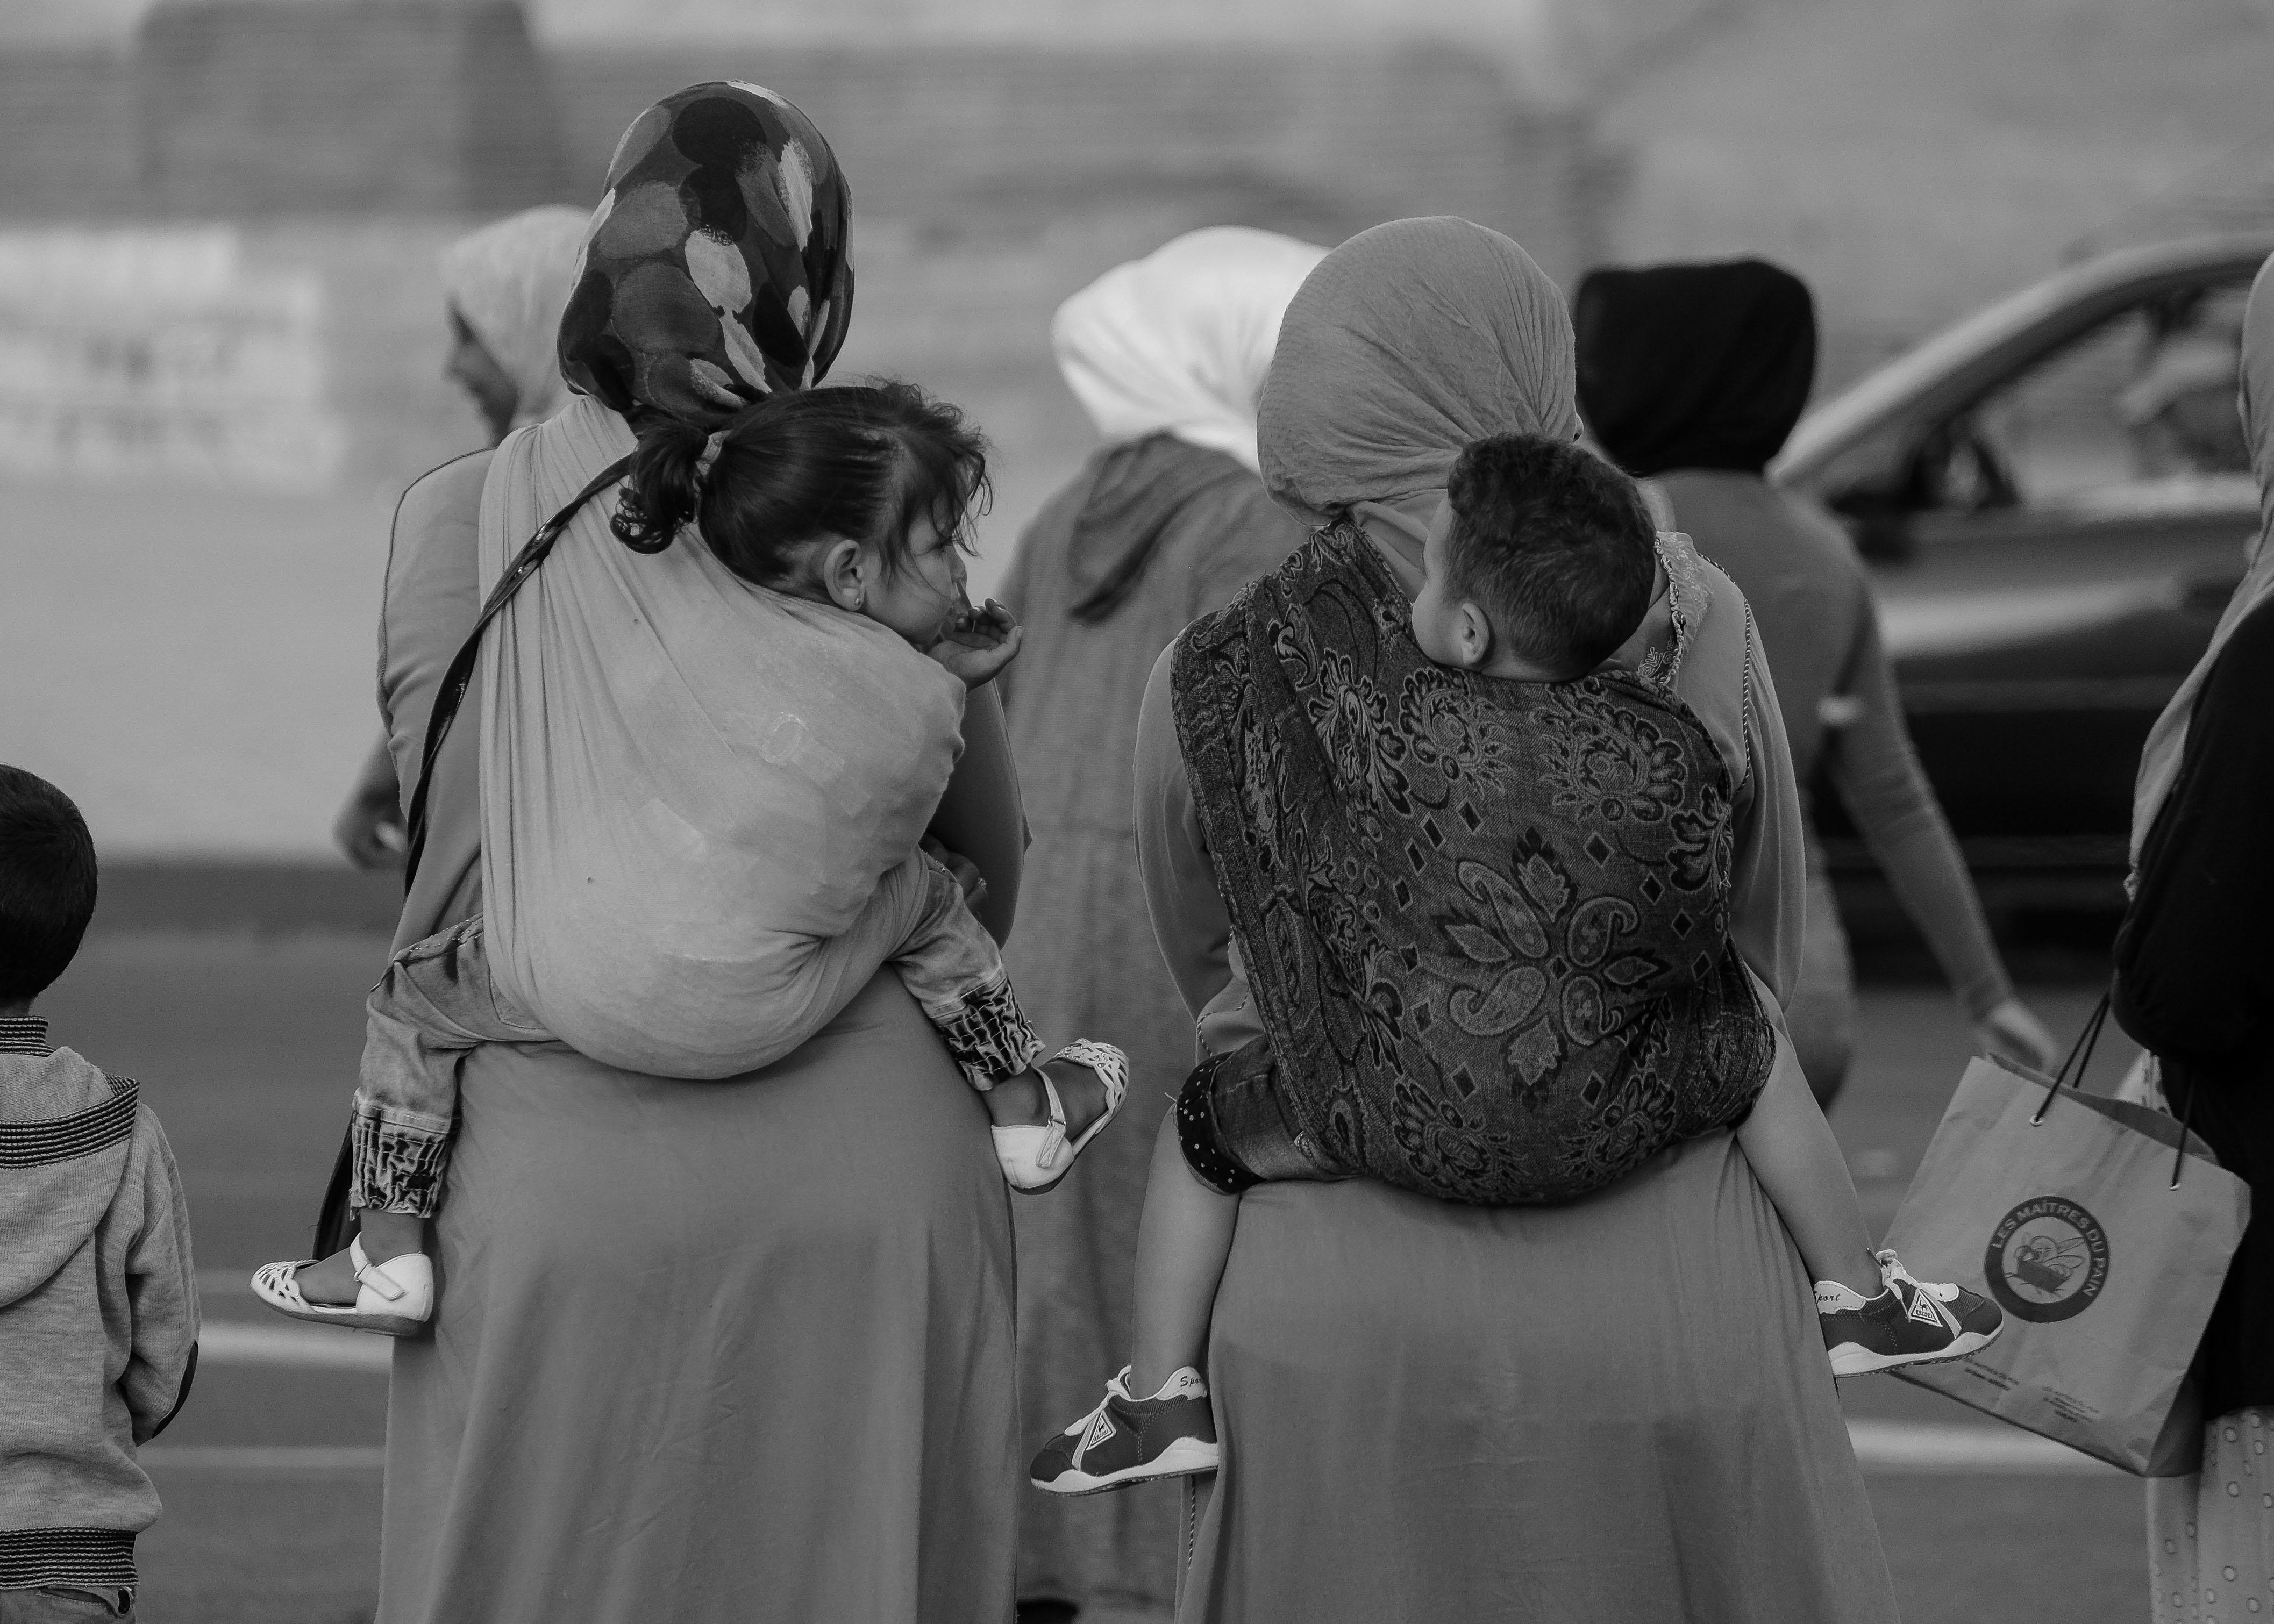 Maroc bnw (26 of 26)